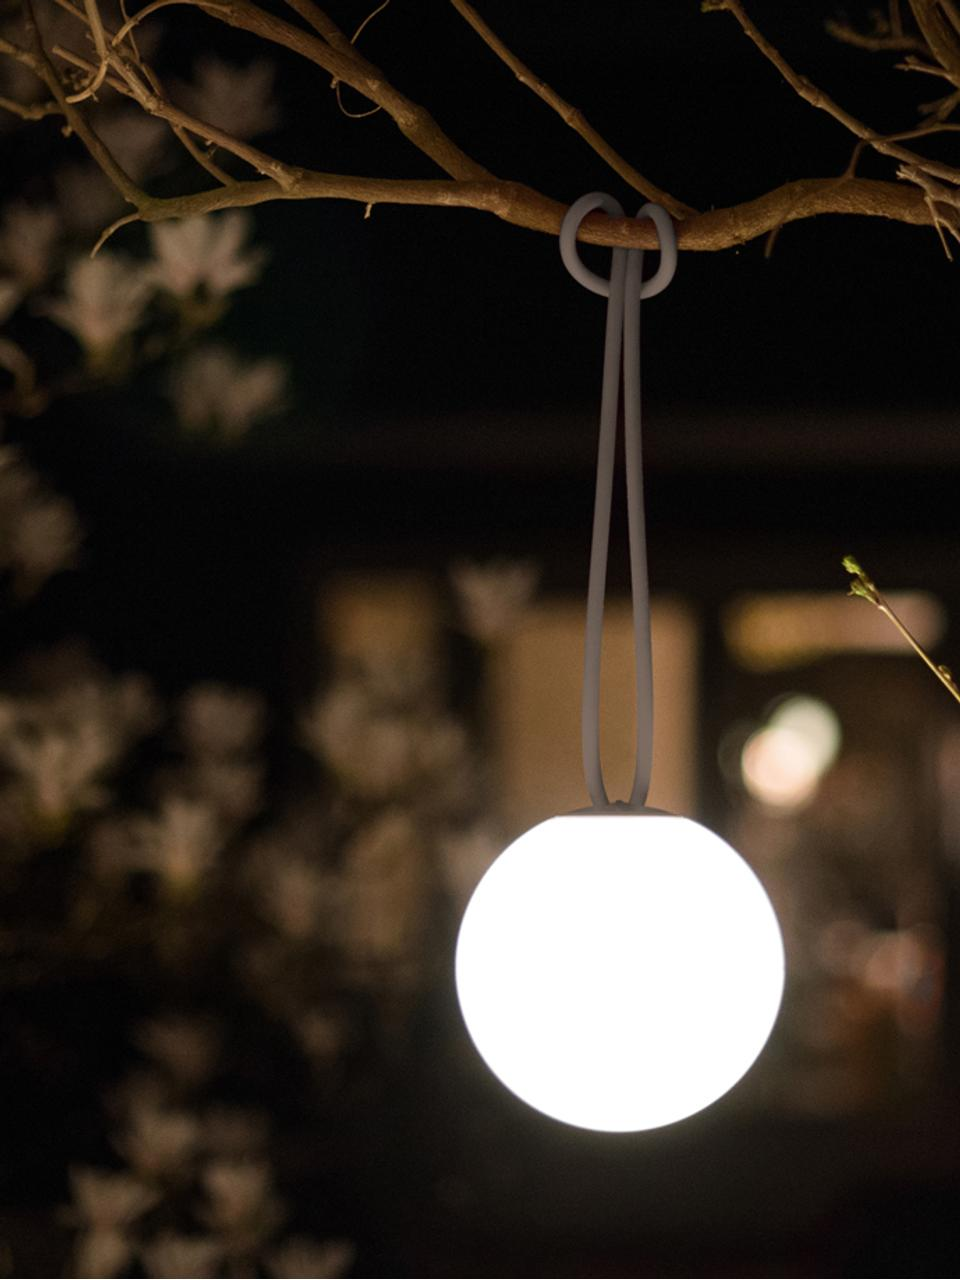 Mobile LED-Außenleuchte Bolleke, Weiß, Taupe, Ø 20 x H 20 cm